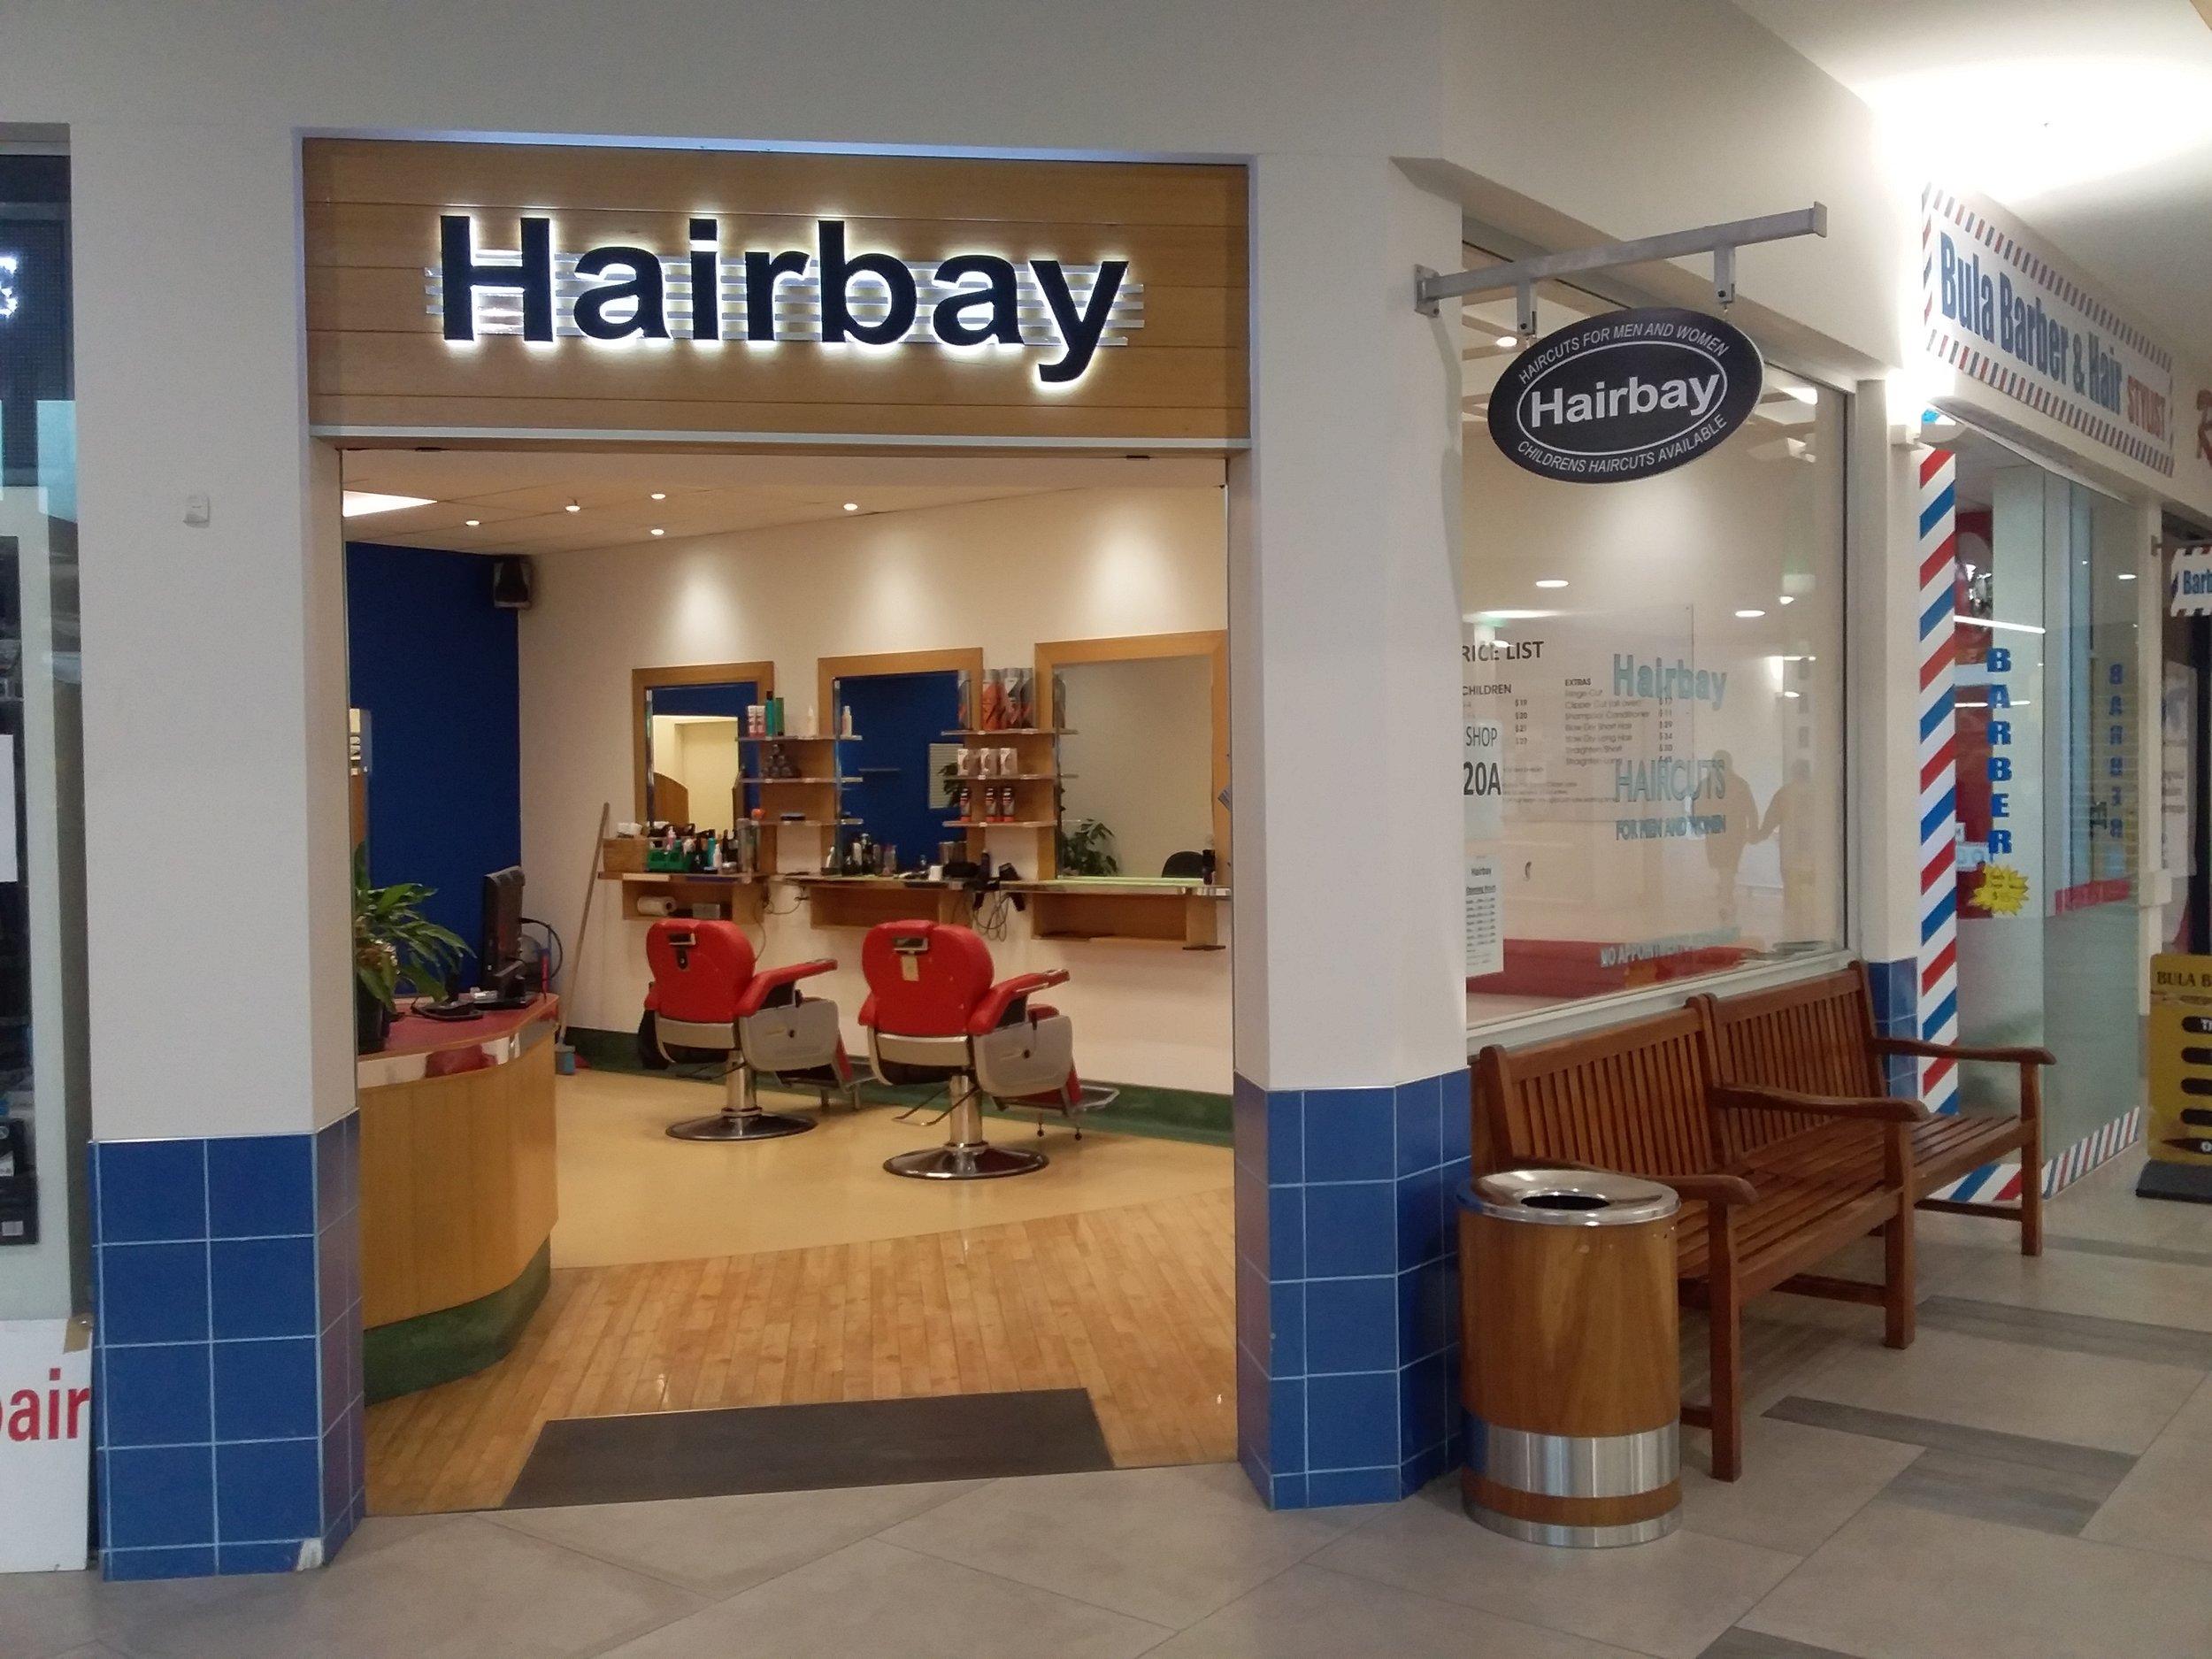 Hairbay.jpg